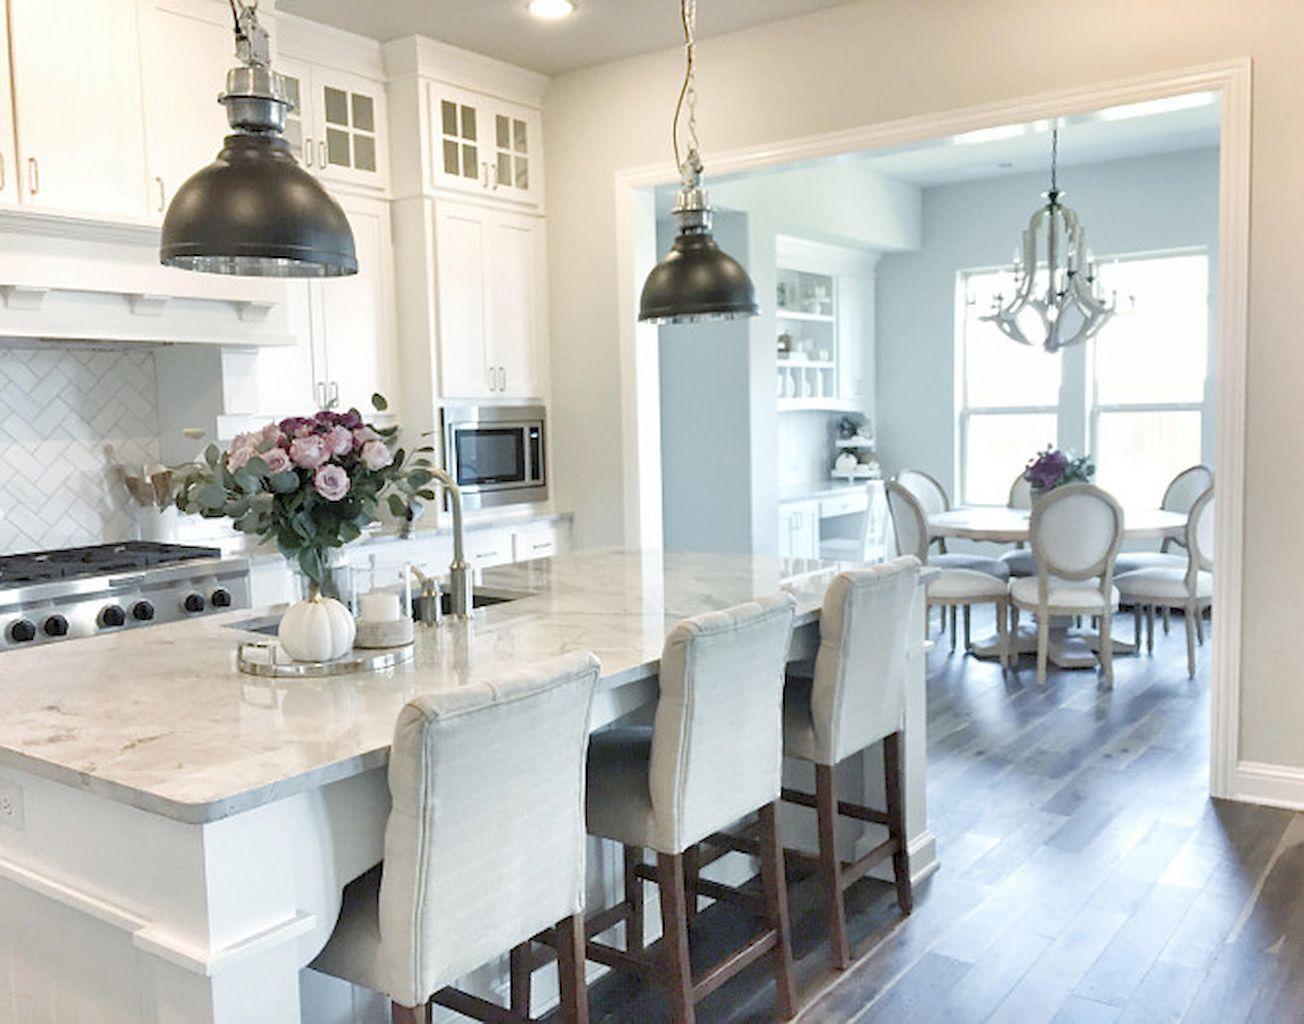 beautiful gray kitchen cabinets design ideas 5 - Kitchen Cabinets Design Ideas Photos